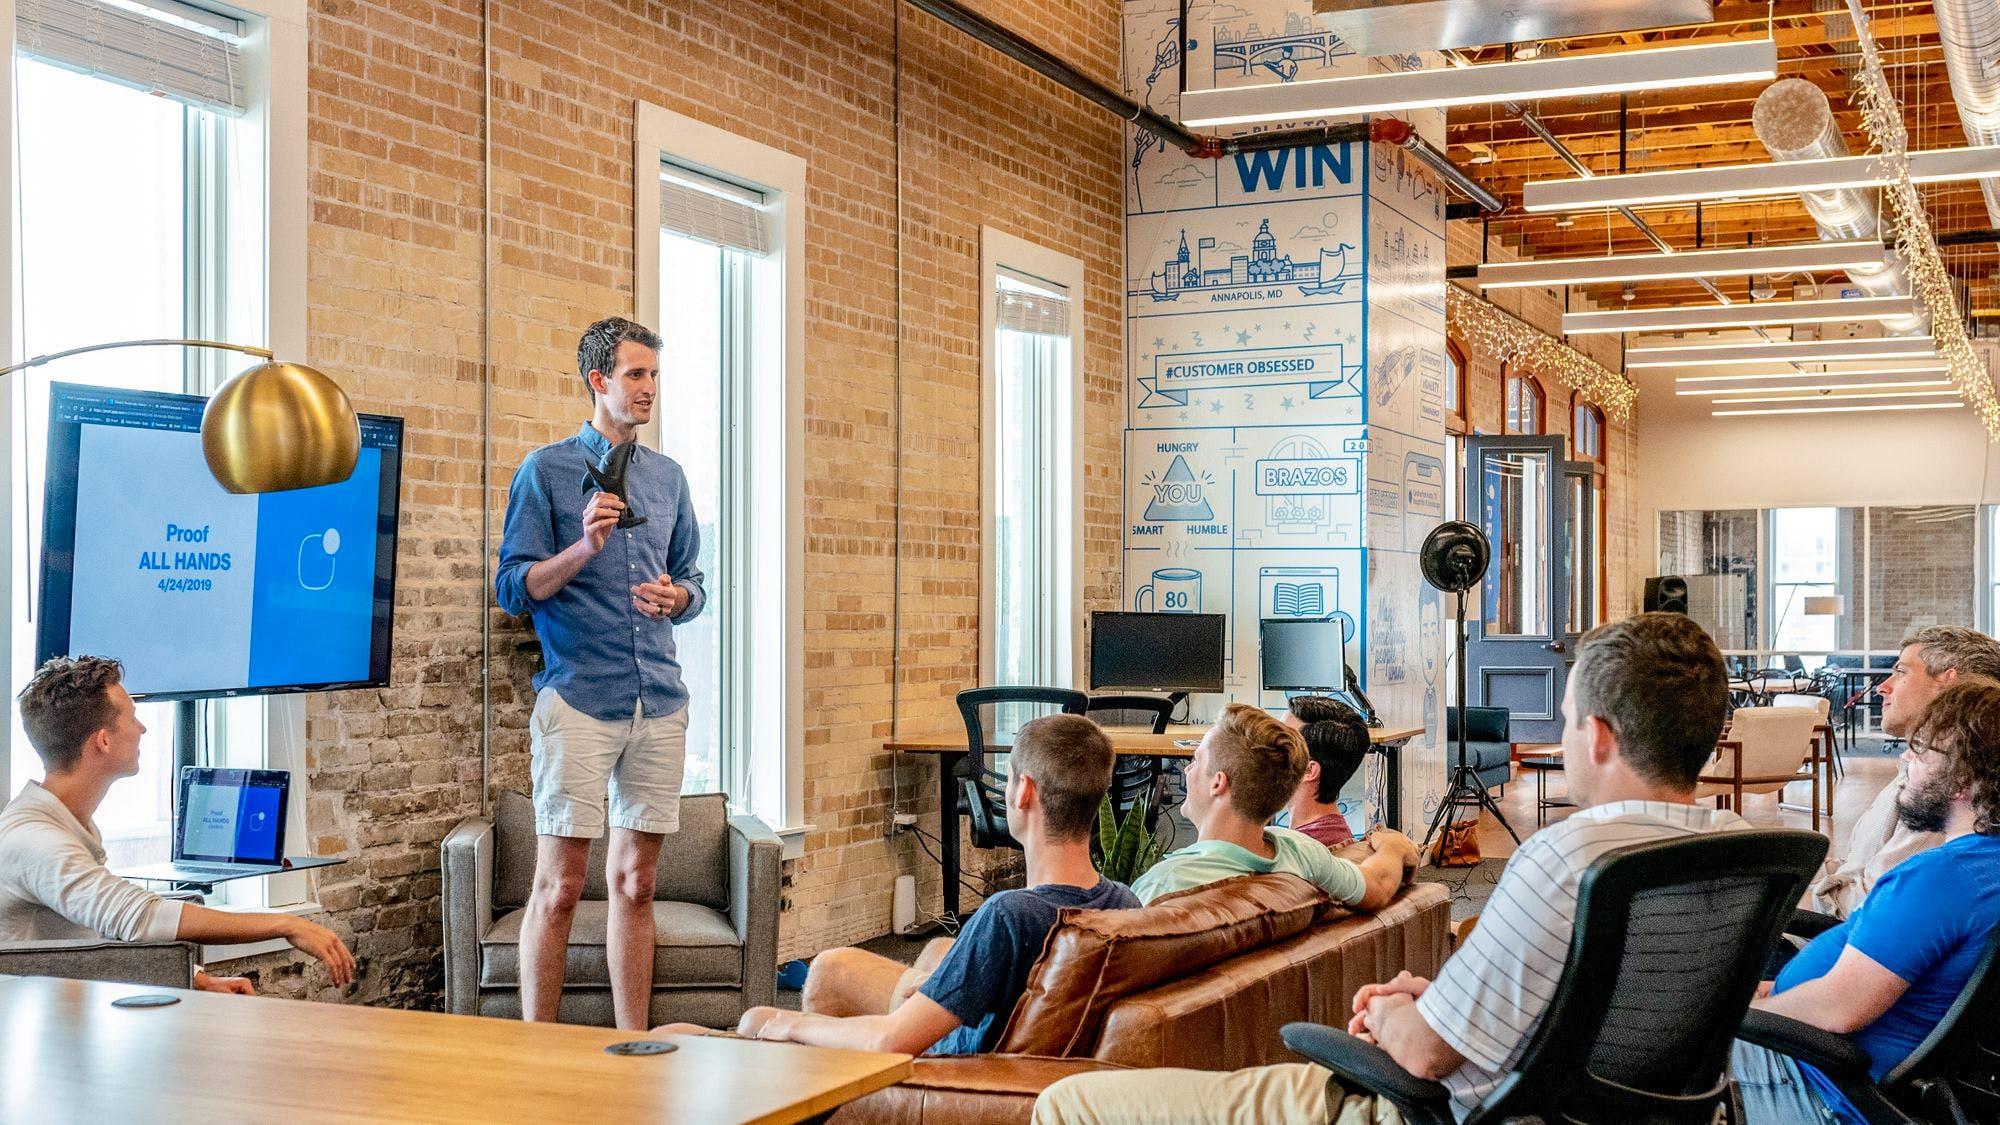 Improv Expert Rita Ritvin Shares 3 Improv Exercises That Can Make You a Better Entrepreneur